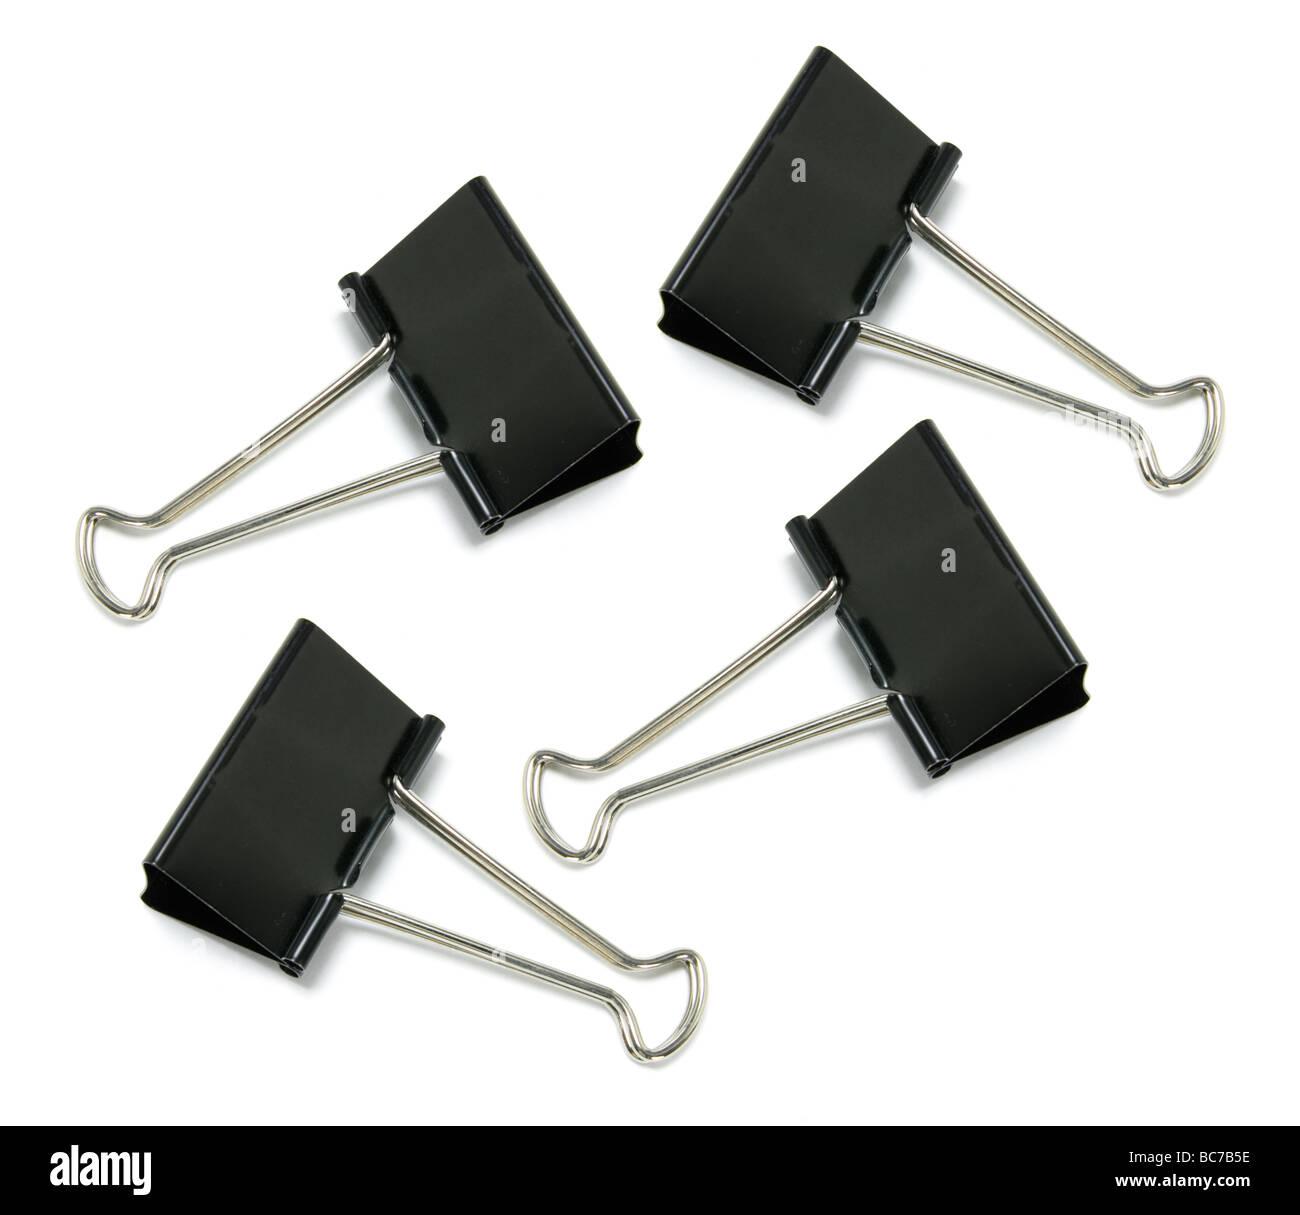 Foldback Paper Clips - Stock Image